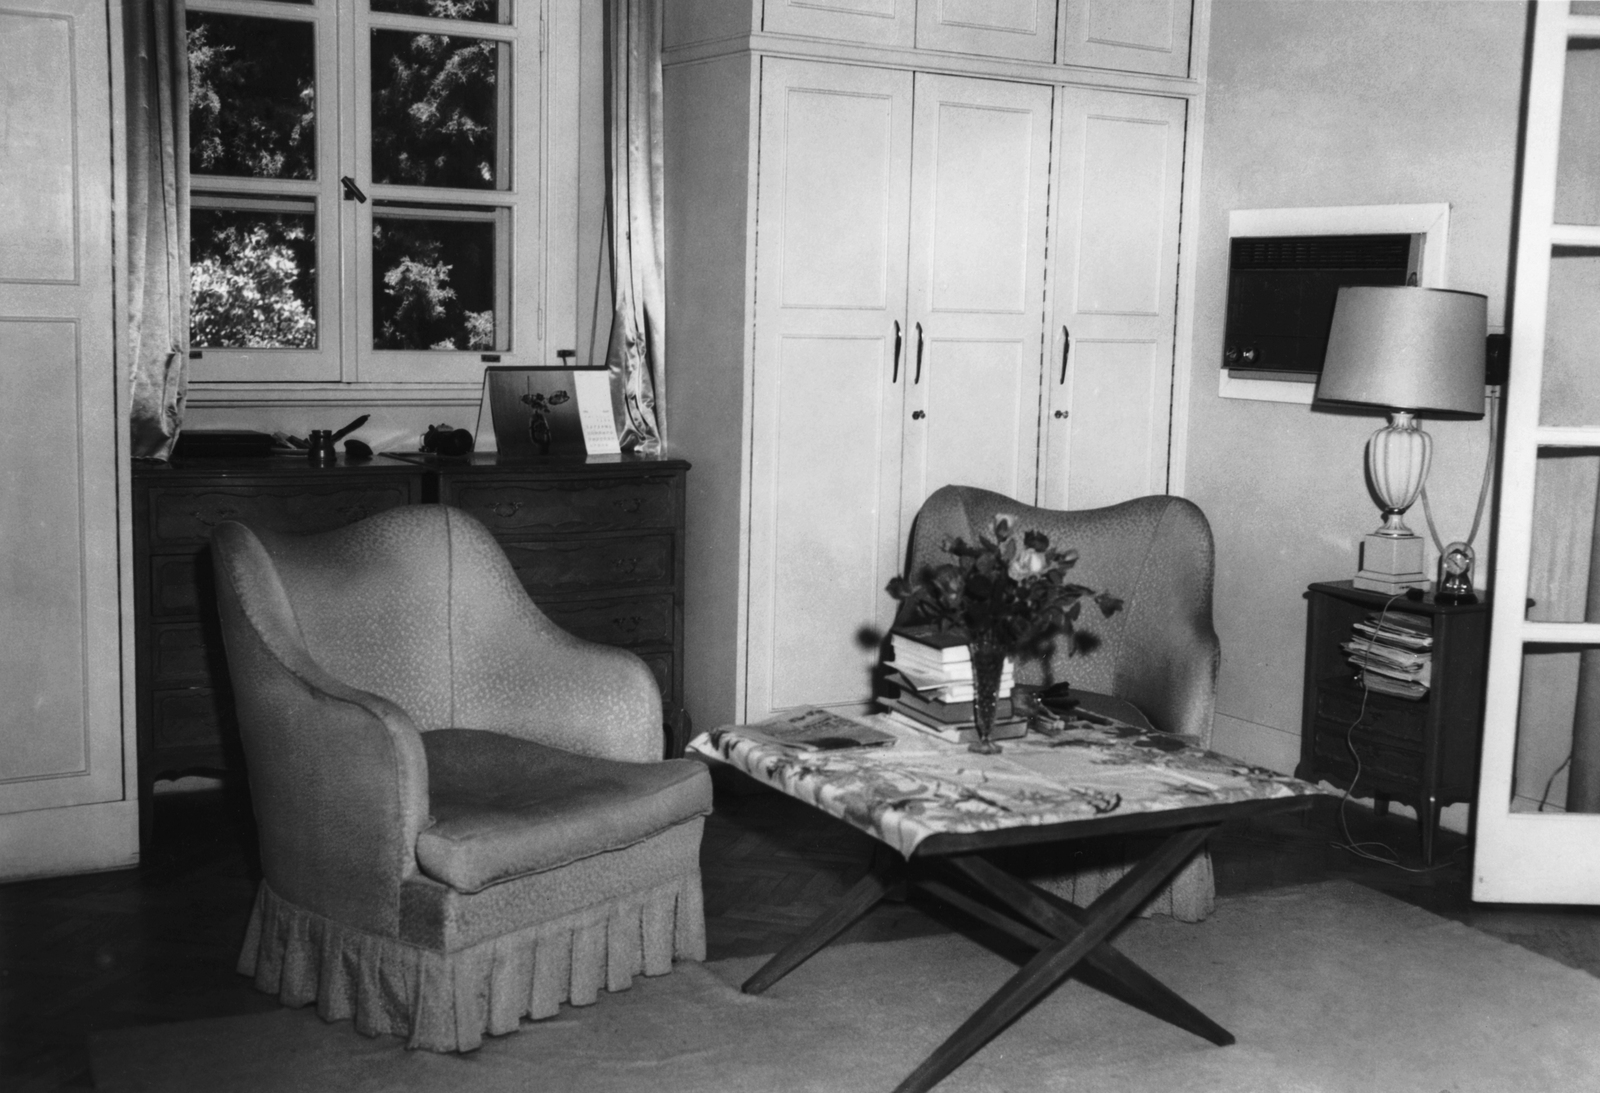 Cairo - Executive Level Position Residence - 1964